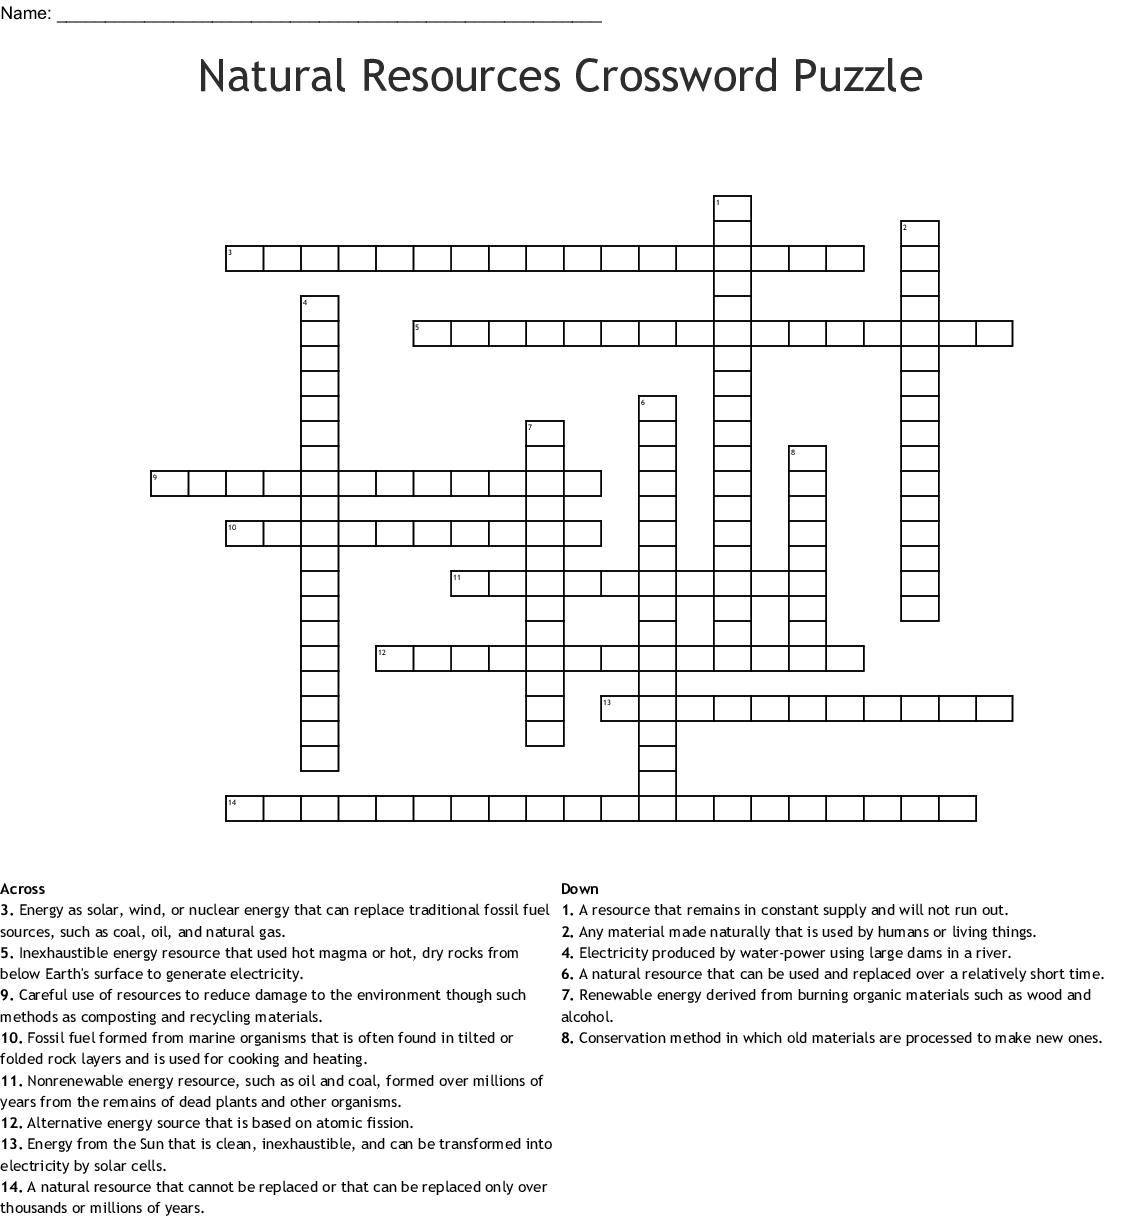 Natural Resources Crossword Puzzle Crossword - Wordmint - Recycling Crossword Puzzle Printable